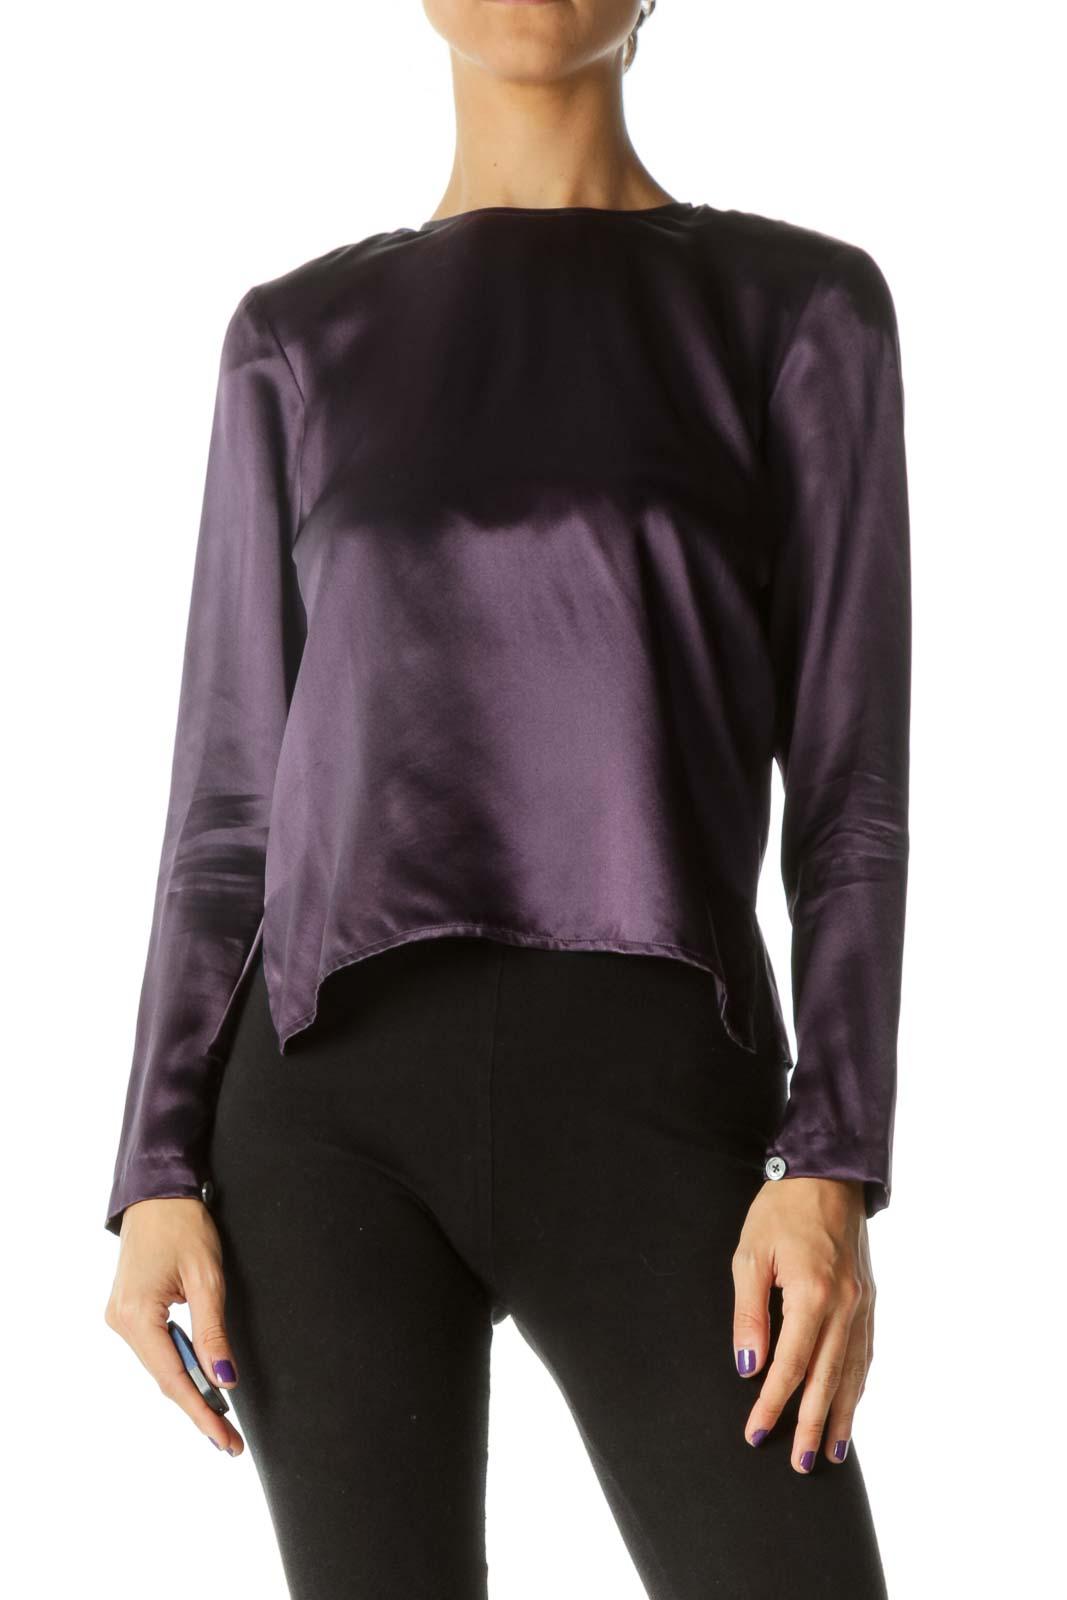 Purple 100% Silk Back Buttons Soft Shiny Top (Shoulder Pads) Front